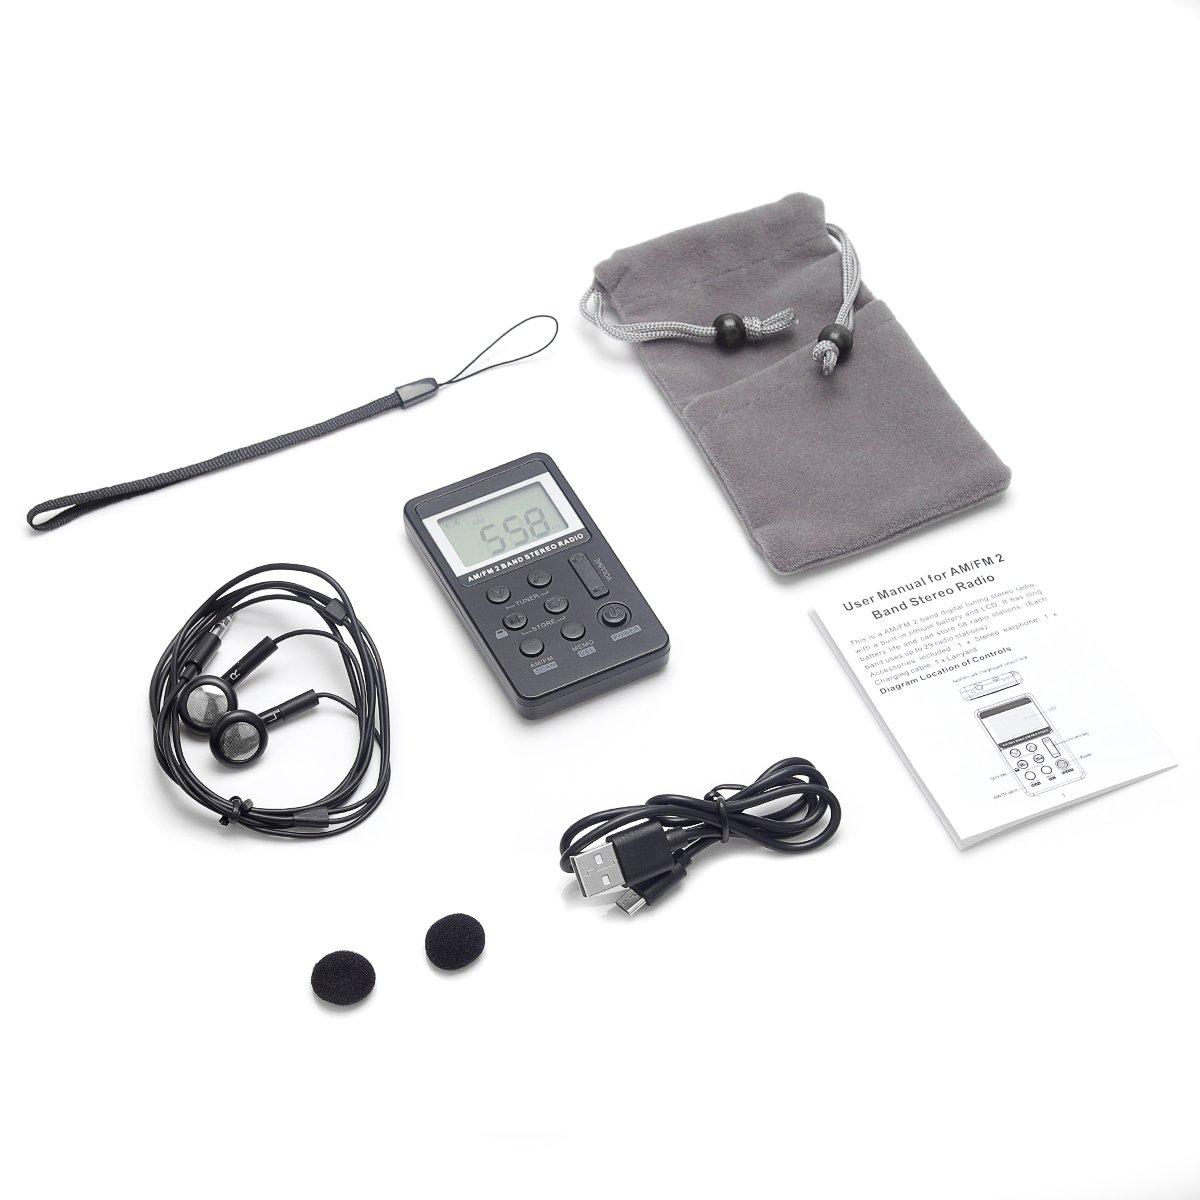 Pocket Radio Flyoukki, Mini Am/Fm Portable Digital Radio Best Reception, Earphones, Small Velvet Bag, Lanyard Rechargeable Battery Emergency, Sport, Walking & Traveling (Black) by Flyoukki (Image #2)